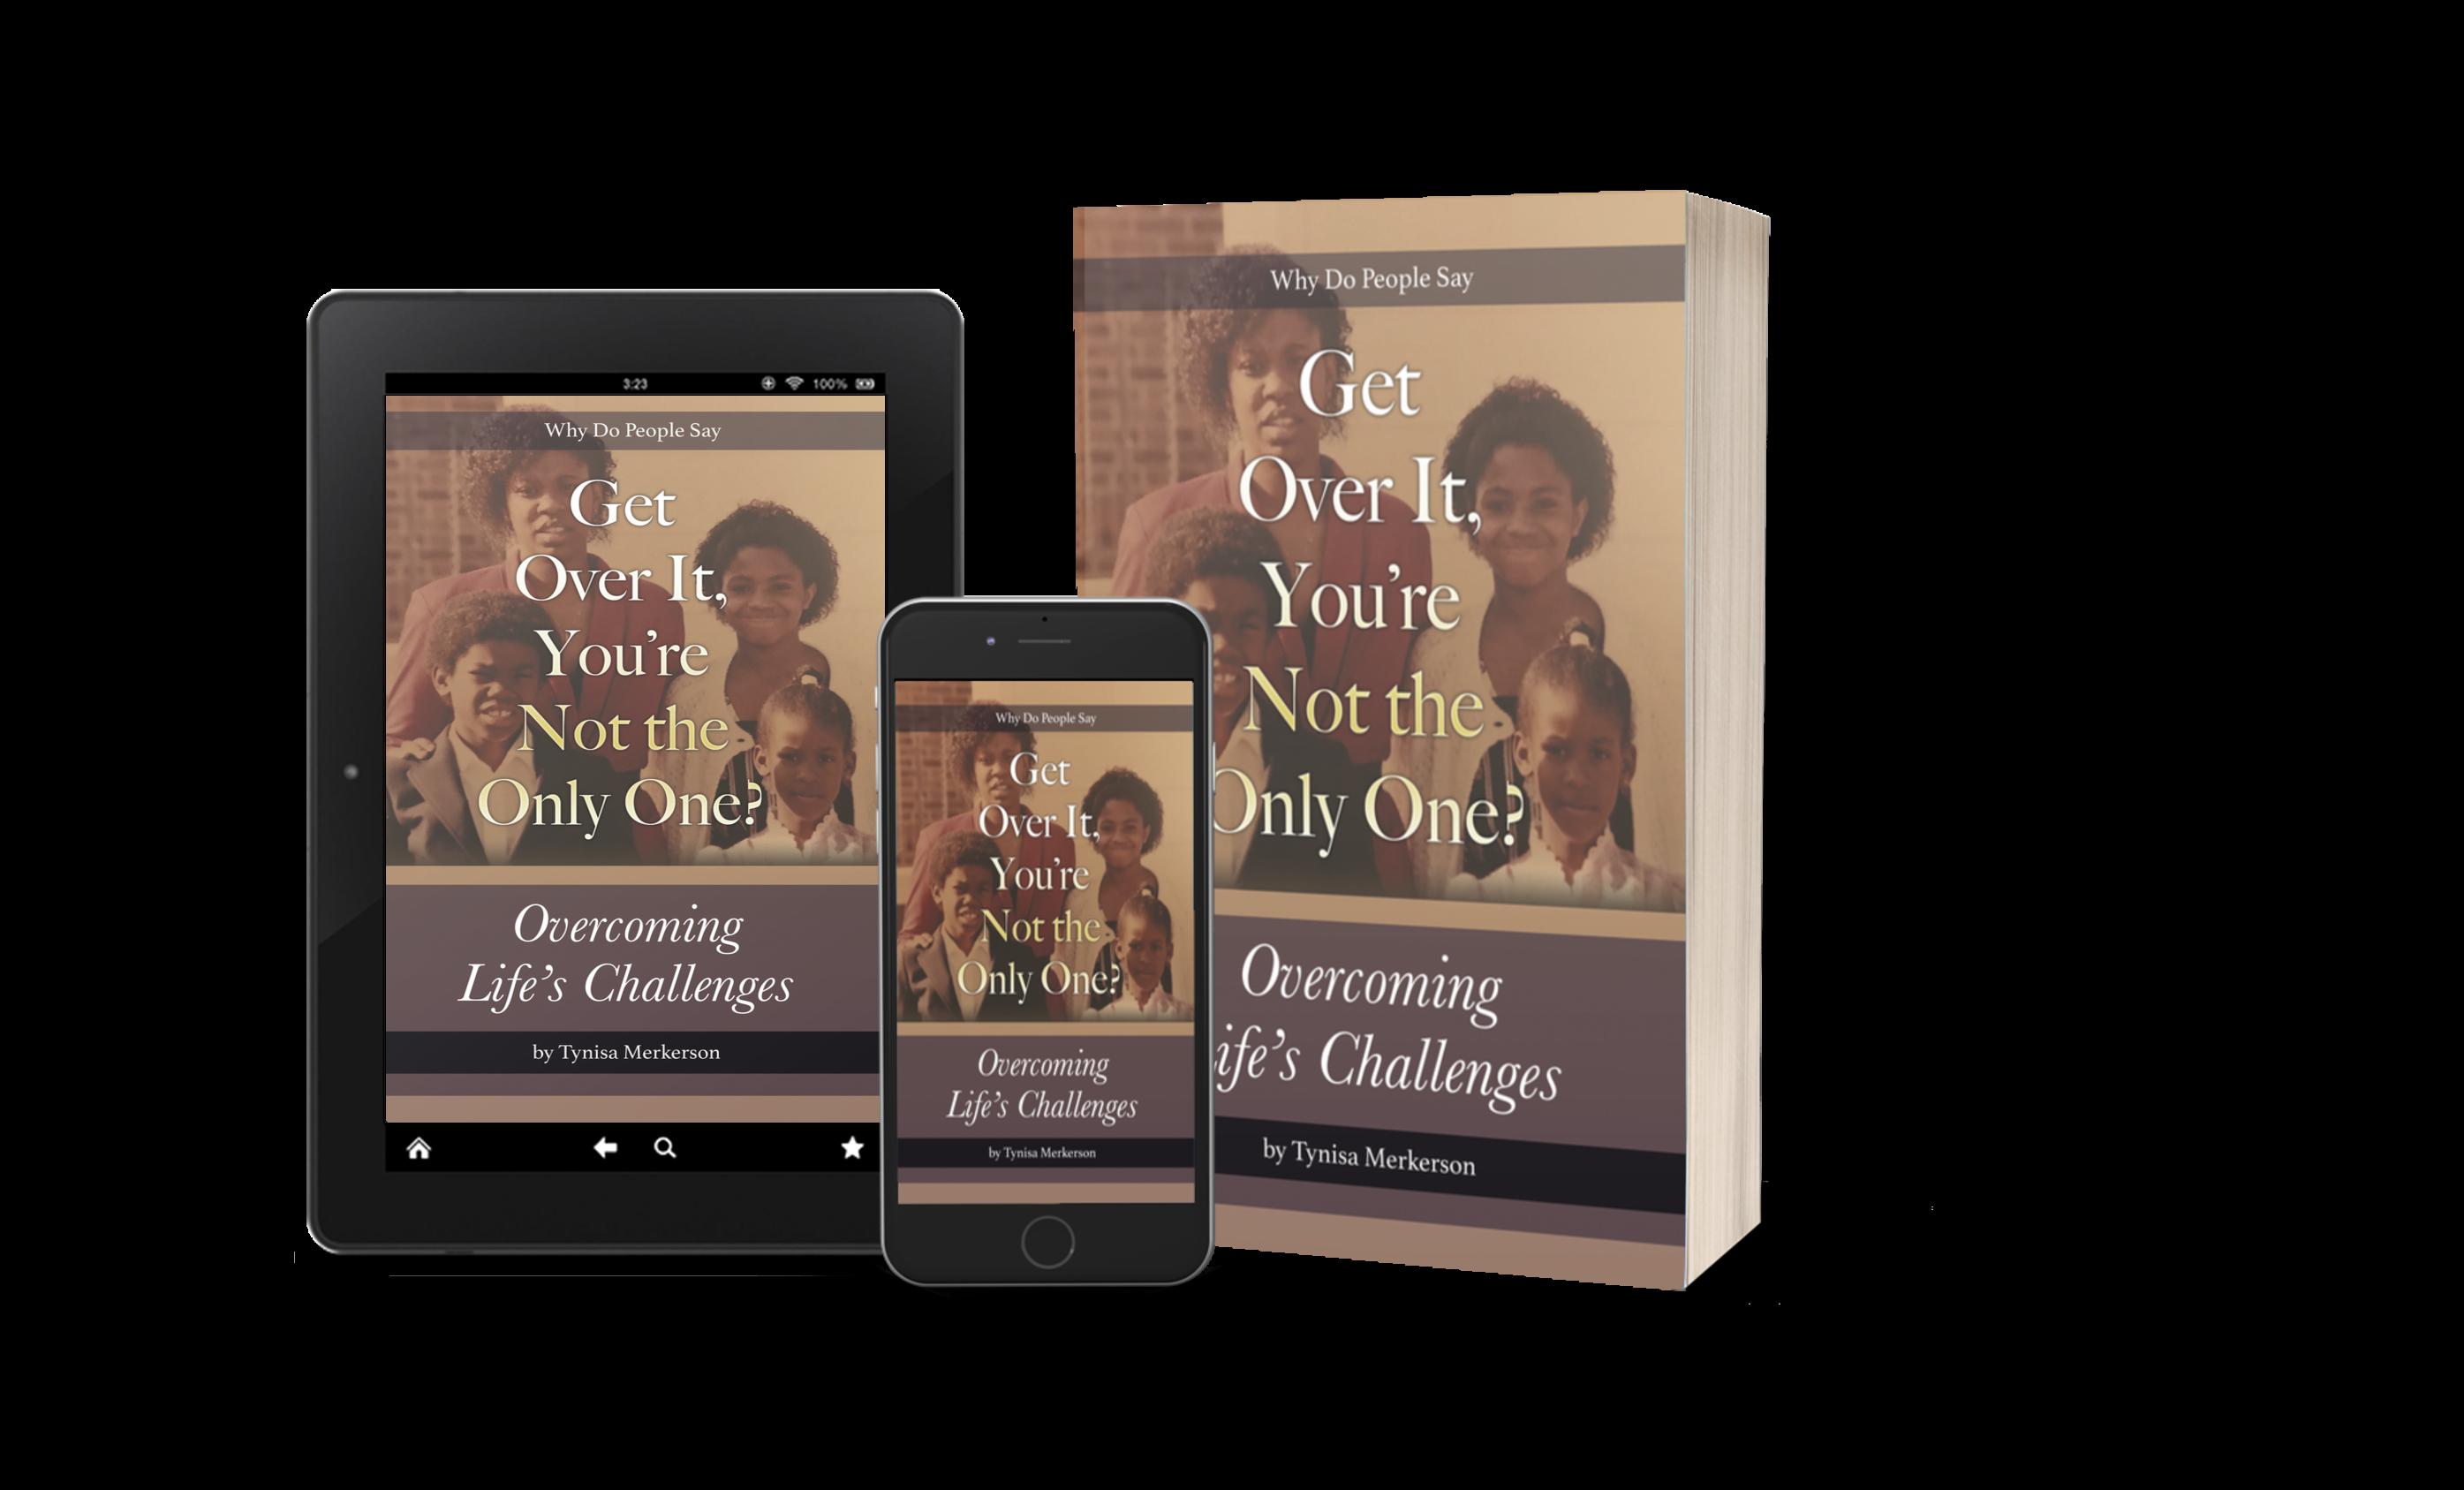 Tynisa Merkerson's New Book Addresses Overcoming Life's Challenges